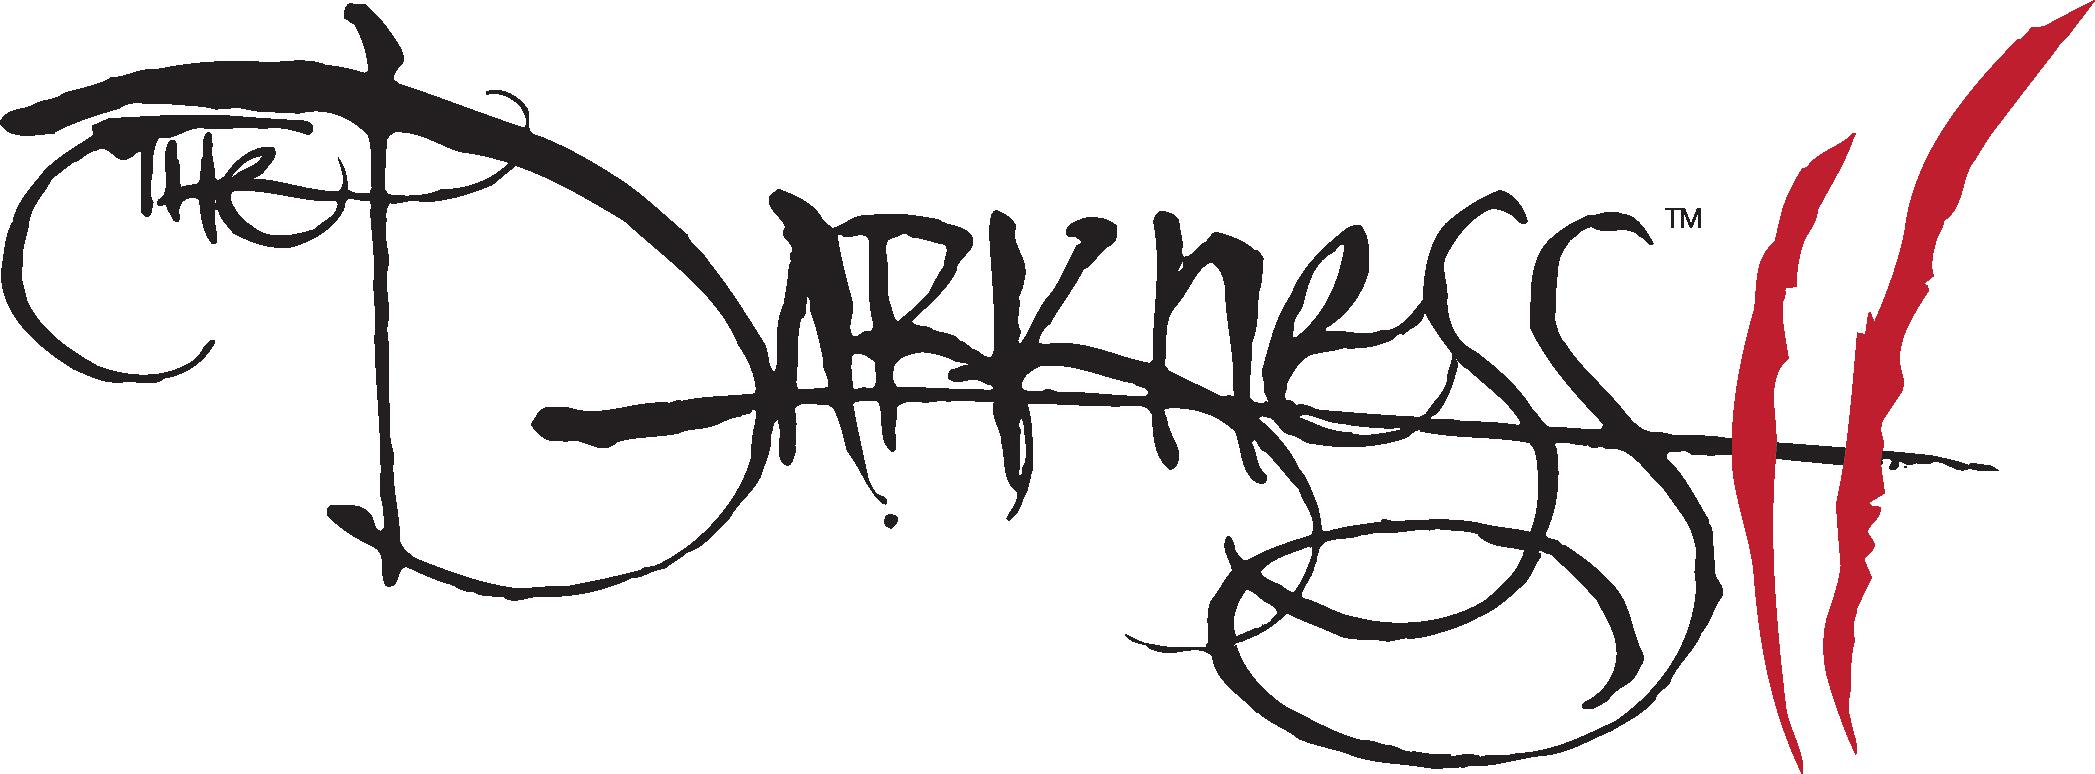 DARKNESS II LOGO